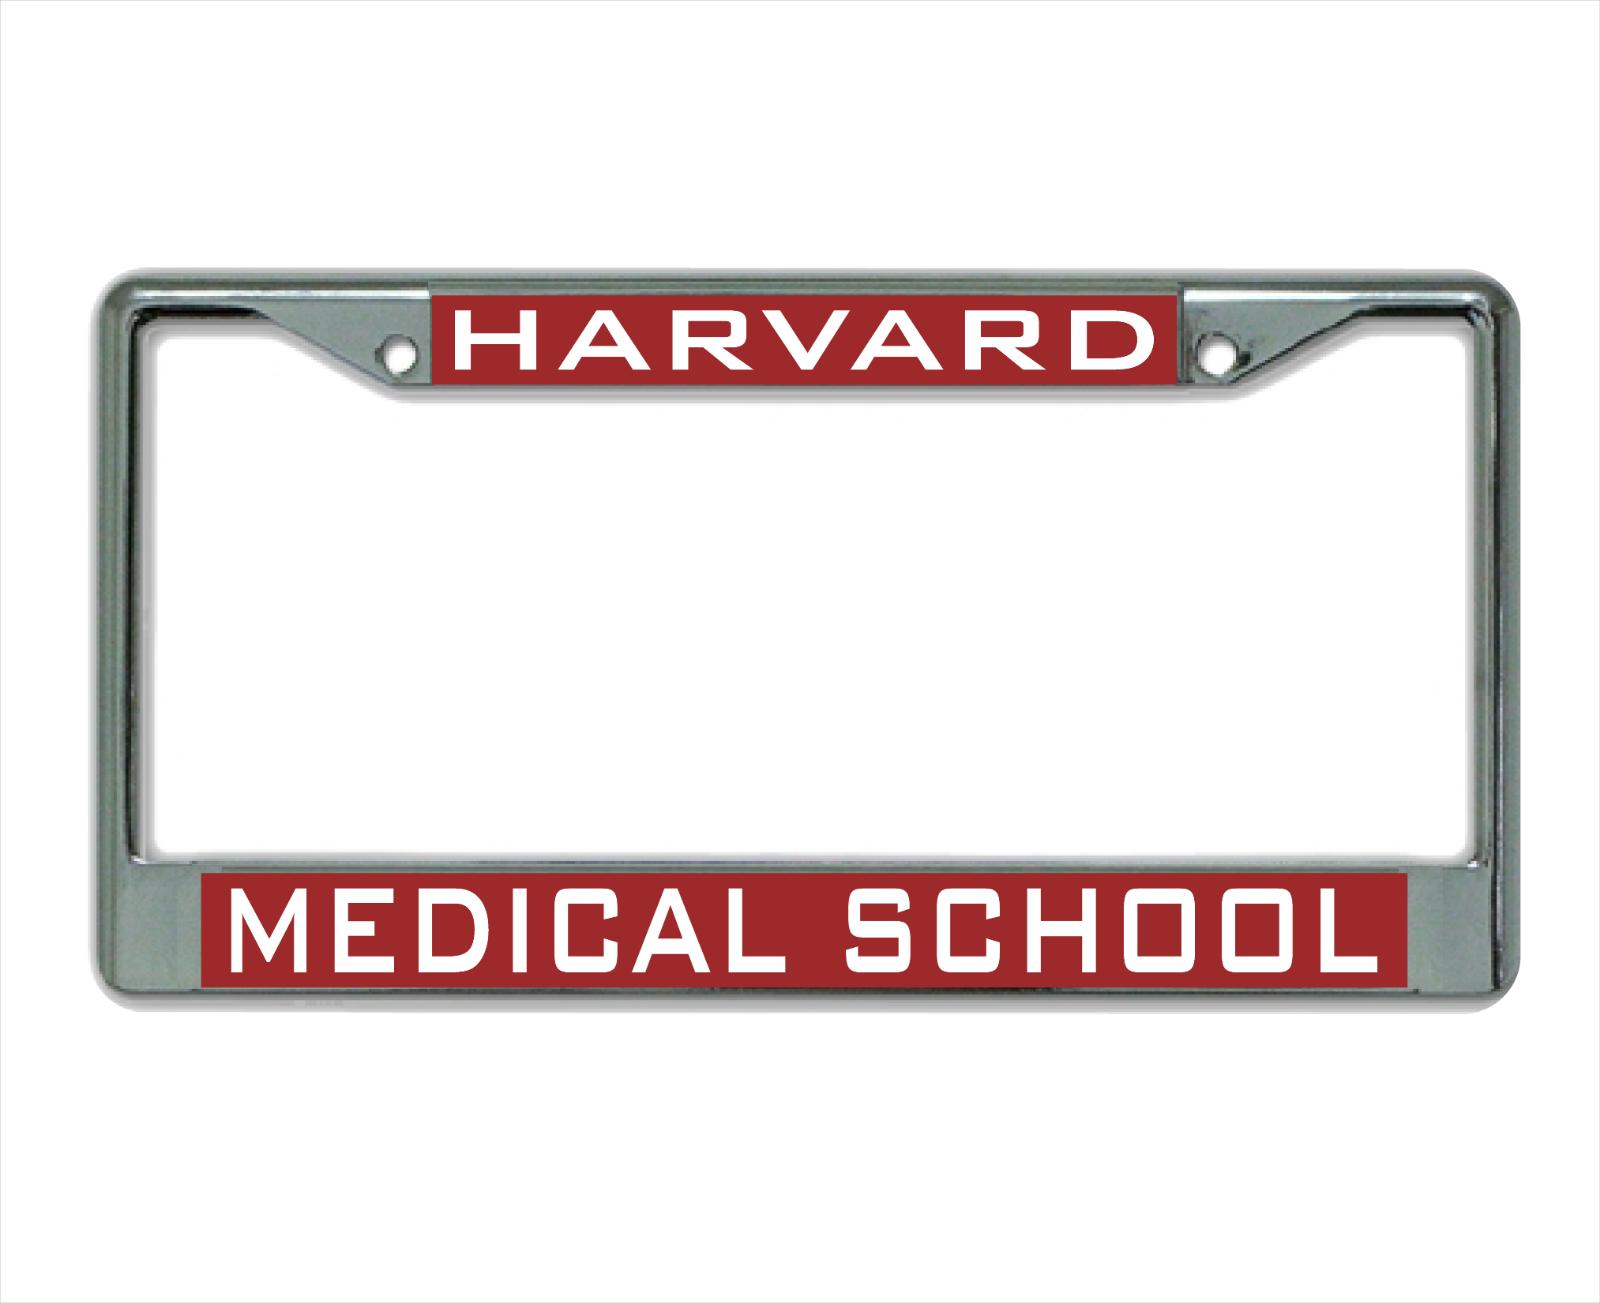 Harvard University MEDICAL SCHOOL License Plate Frame 2